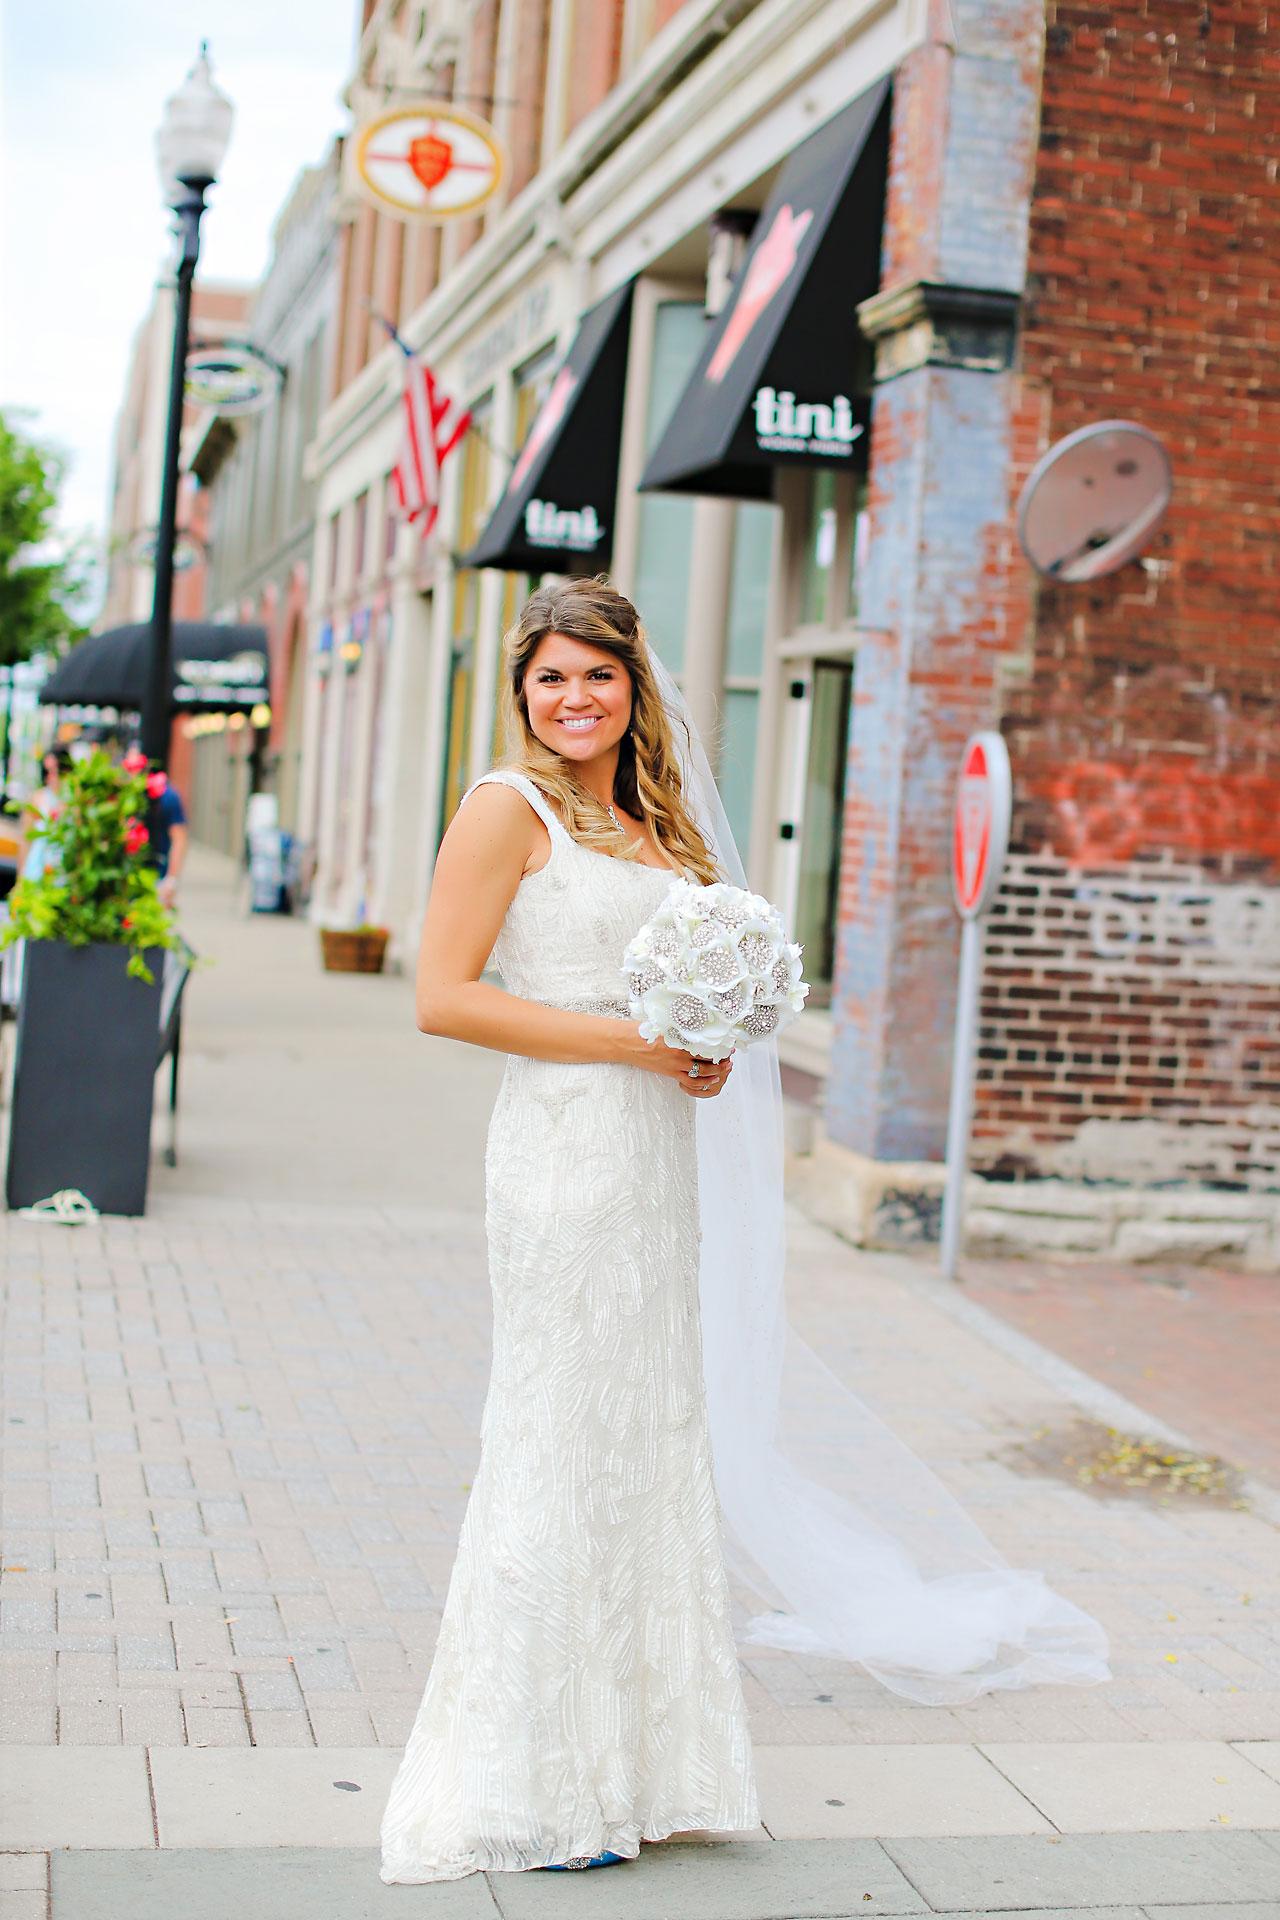 Amy Nick Canal 337 Wedding 088